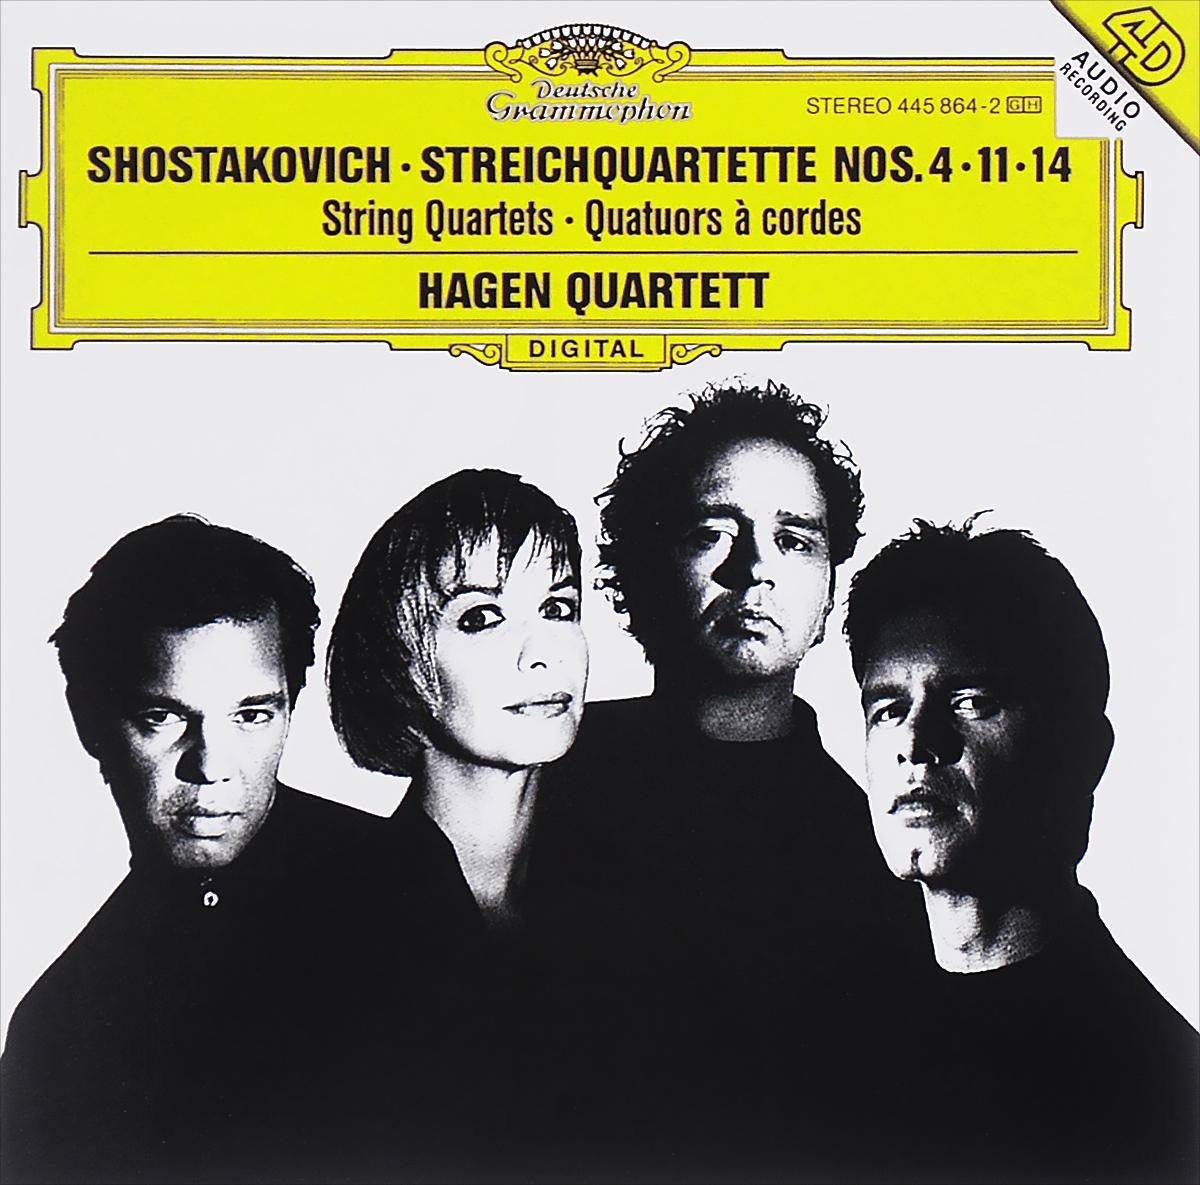 Hagen Quartett Hagen Quartett. Shostakovich. String Quartets No.4 / 11 / 14 f kauffmann quartett op 14